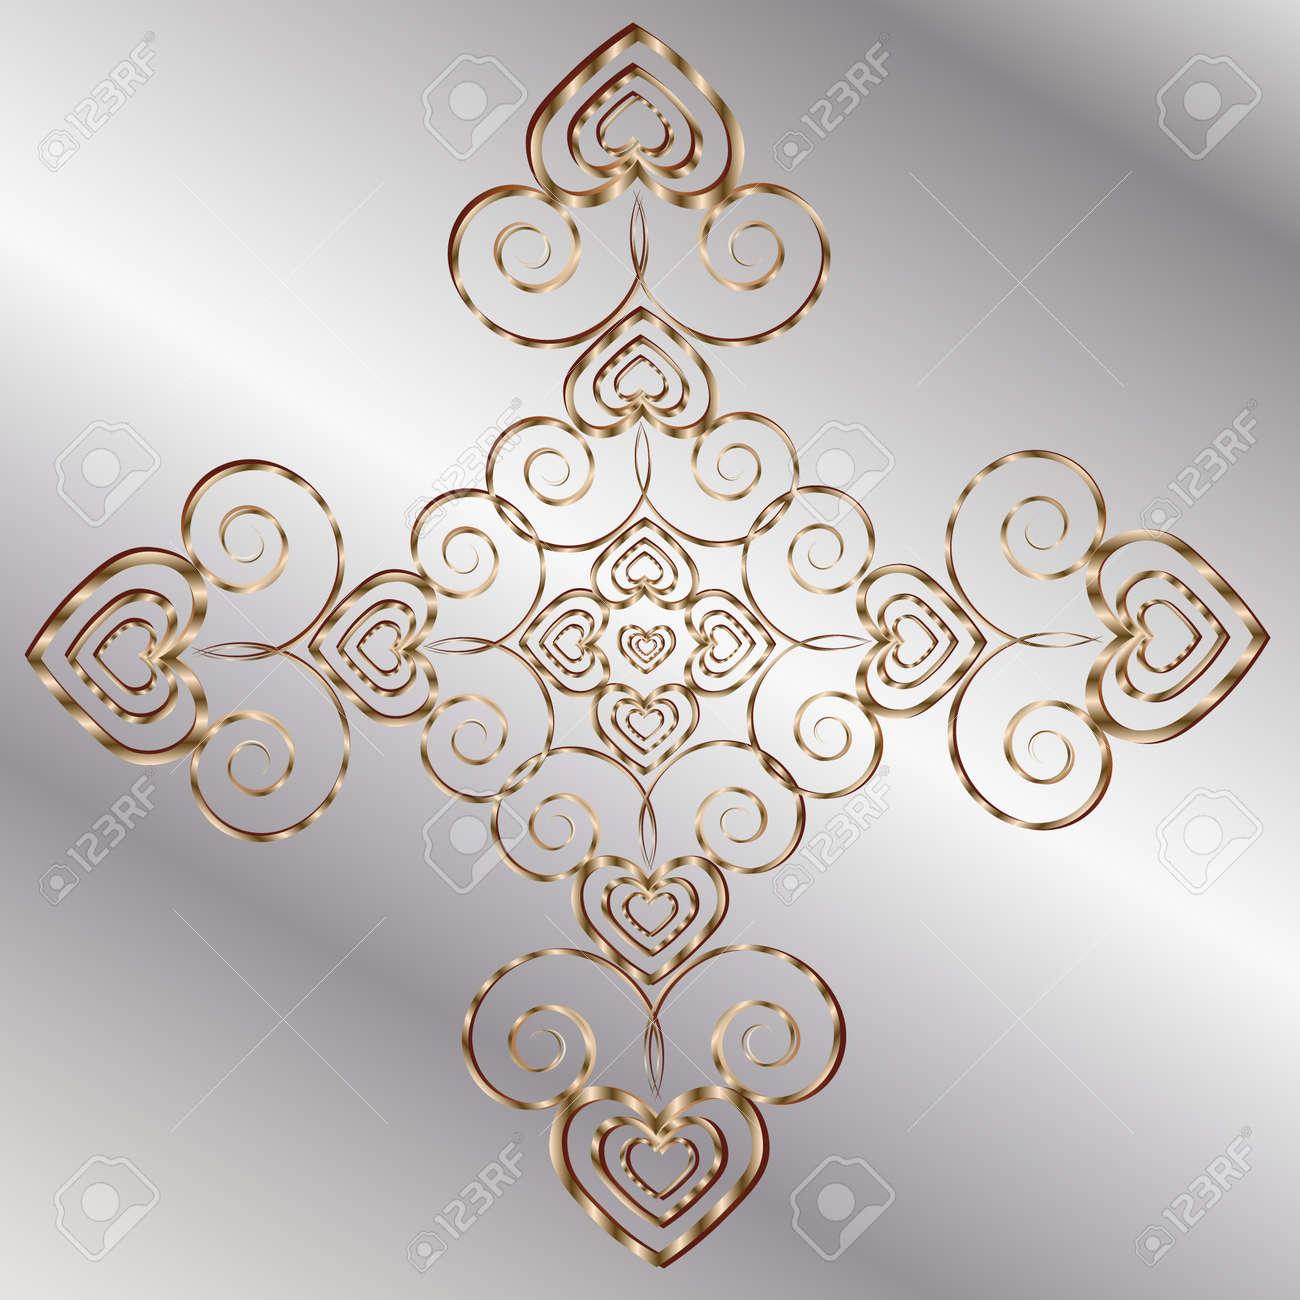 Tarjeta De San Valentín Mandala Simétrica Corazón Autor Del Diseño ...